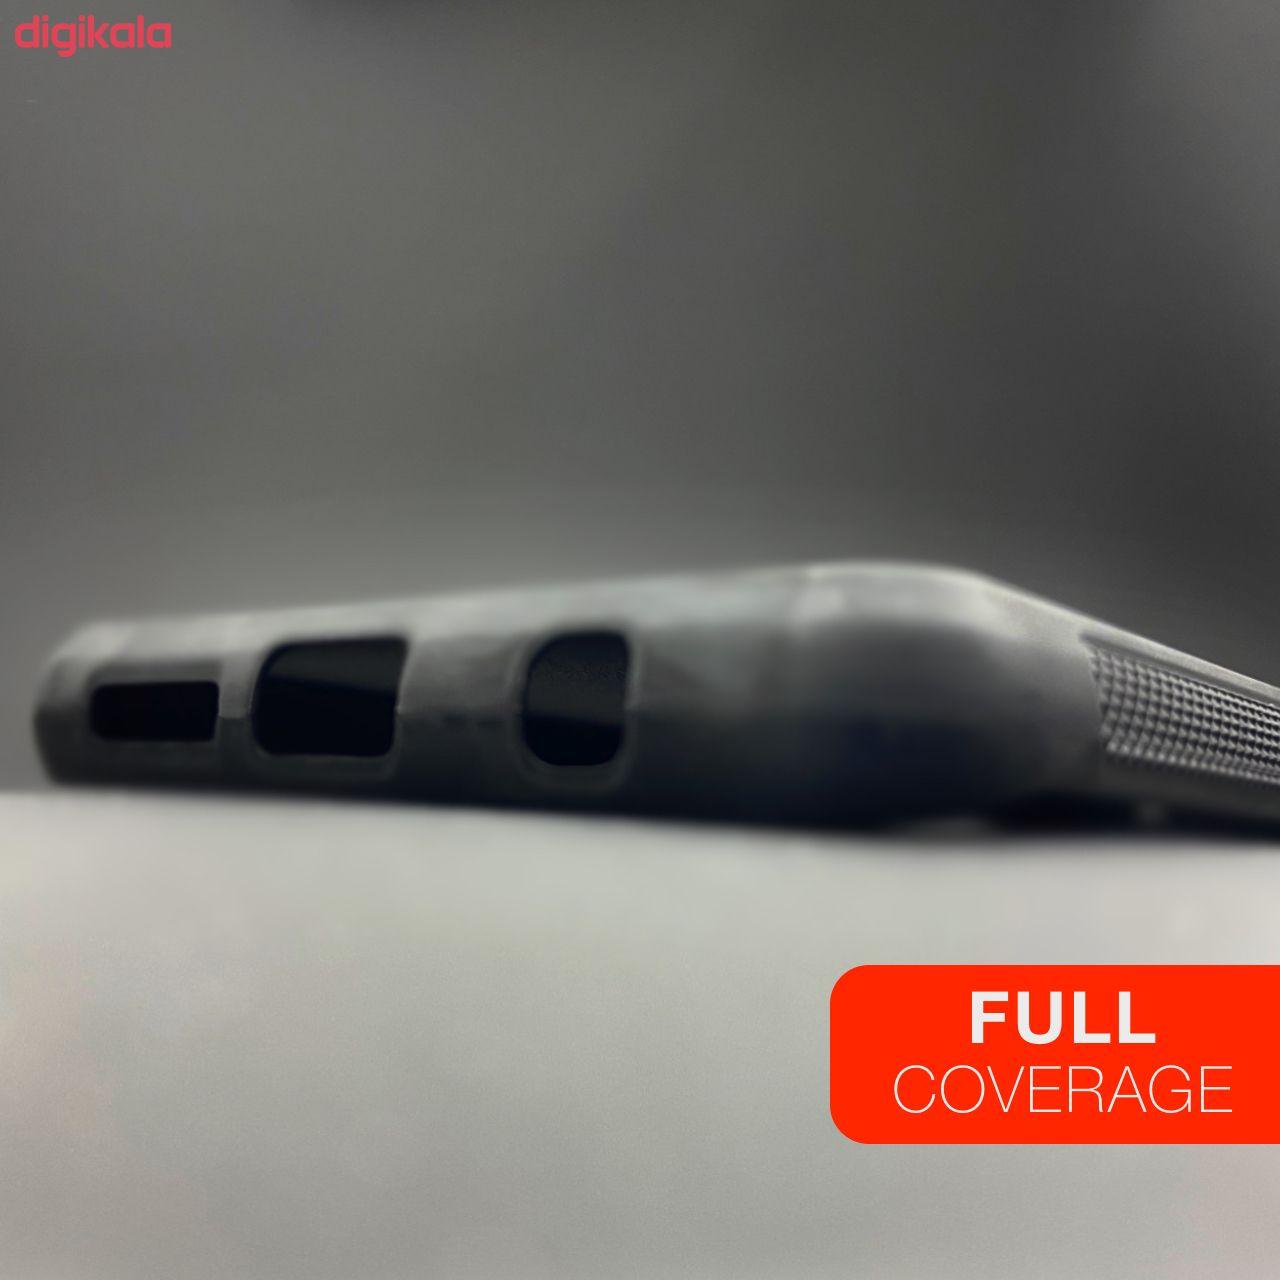 کاور آکام مدل Aasev2350 مناسب برای گوشی موبایل سامسونگ Galaxy A7 2018